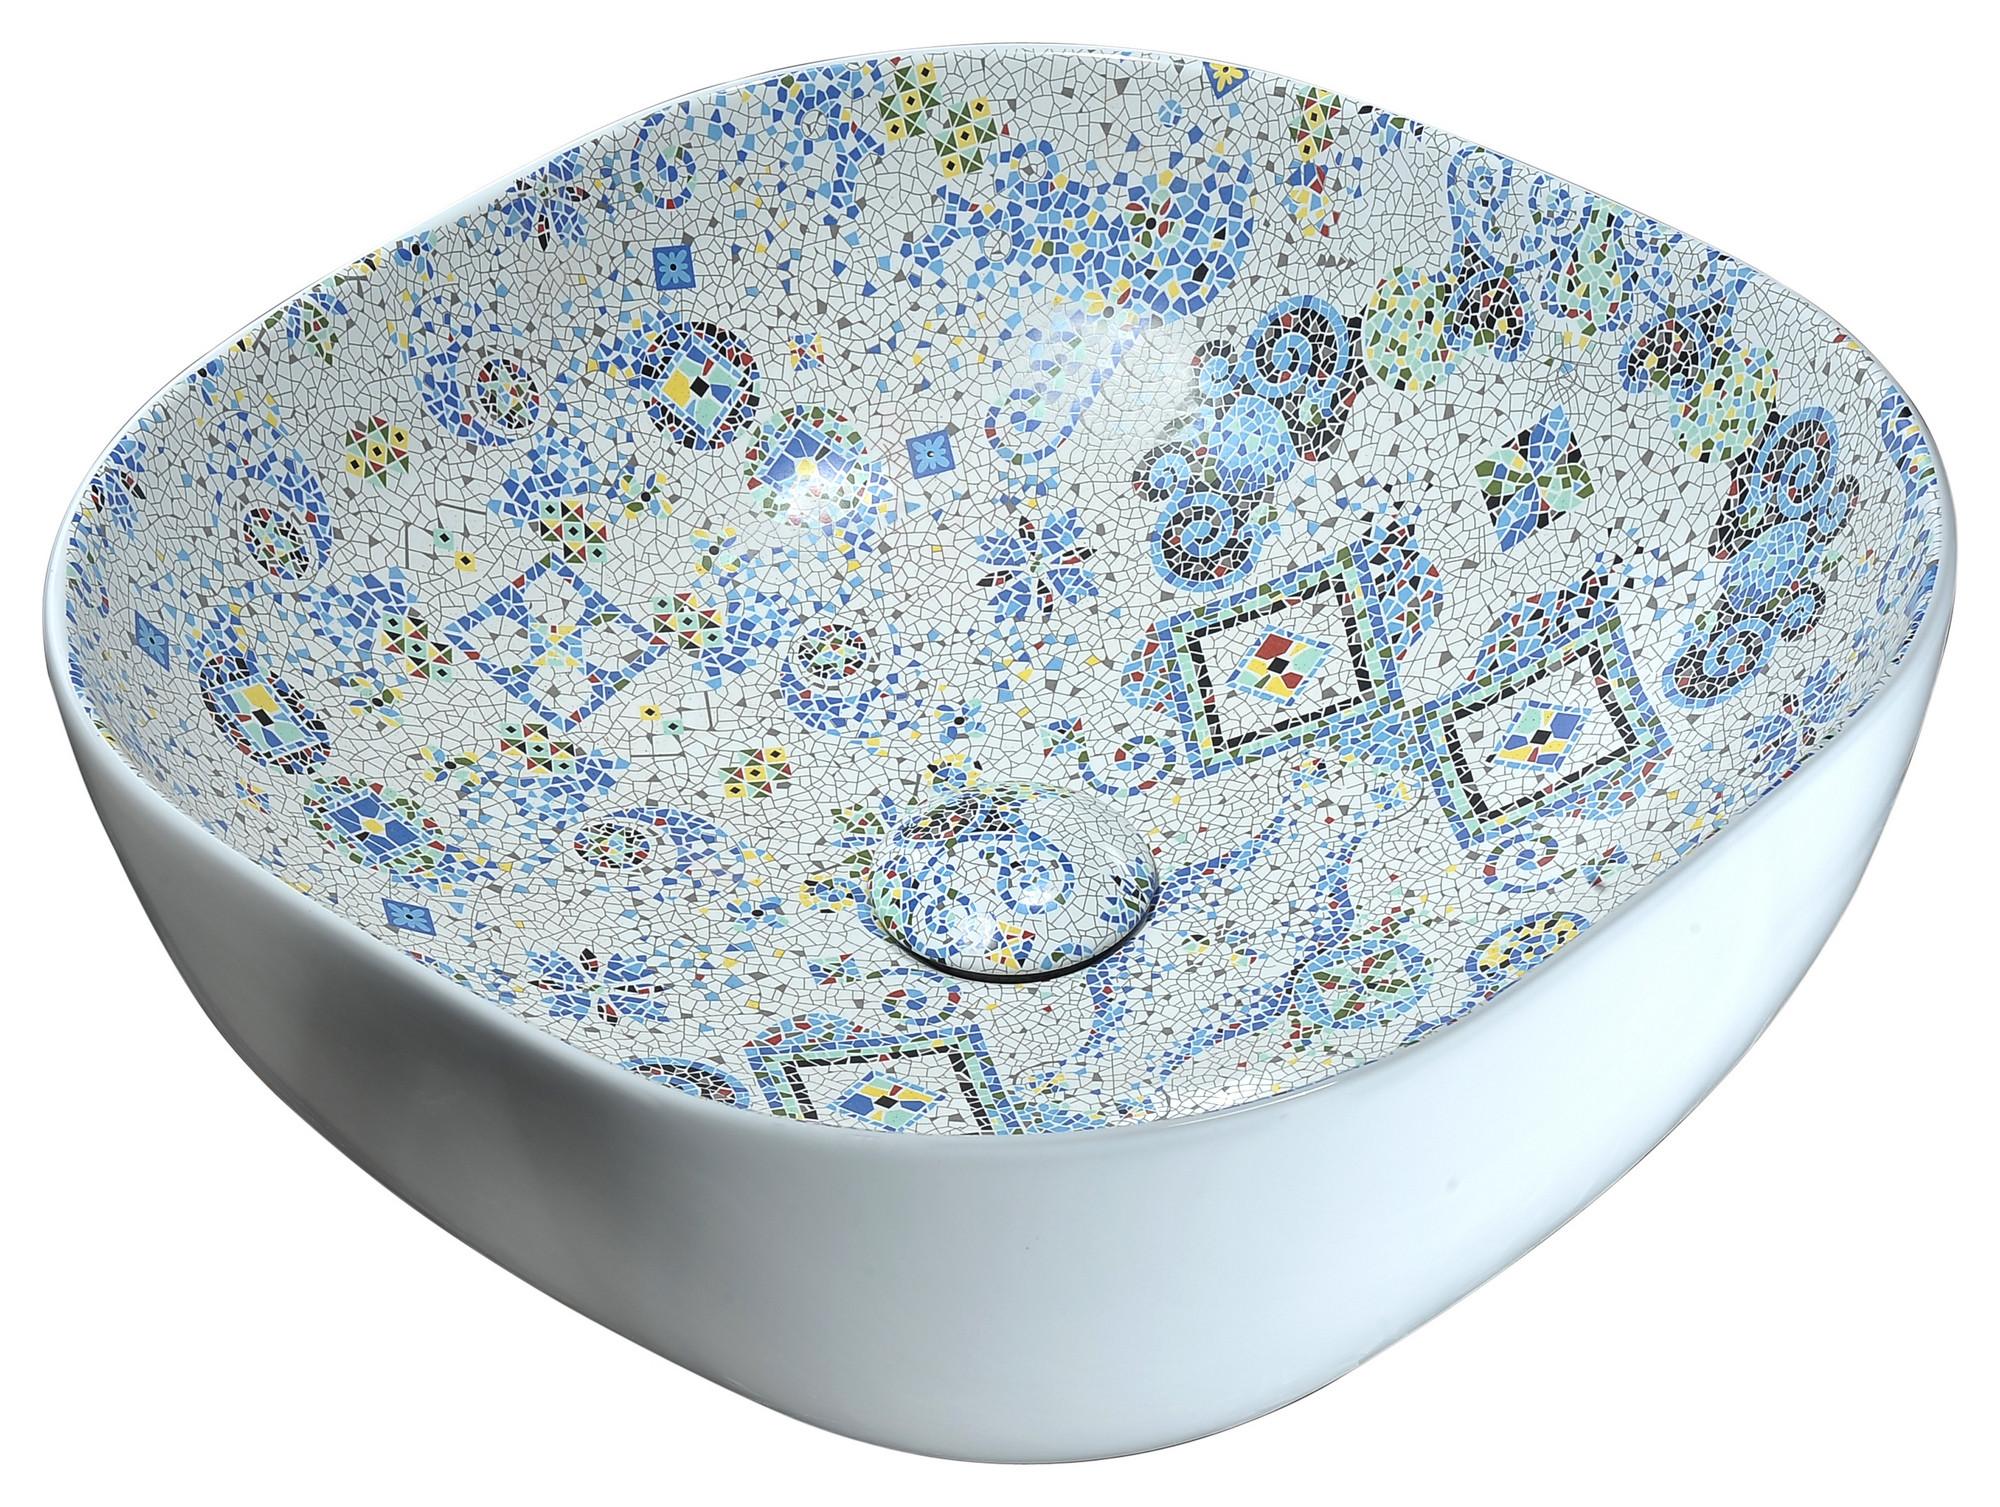 ANZZI LS-AZ246 Byzantian Ceramic Vessel Sink In Byzantine Mosaic Finish